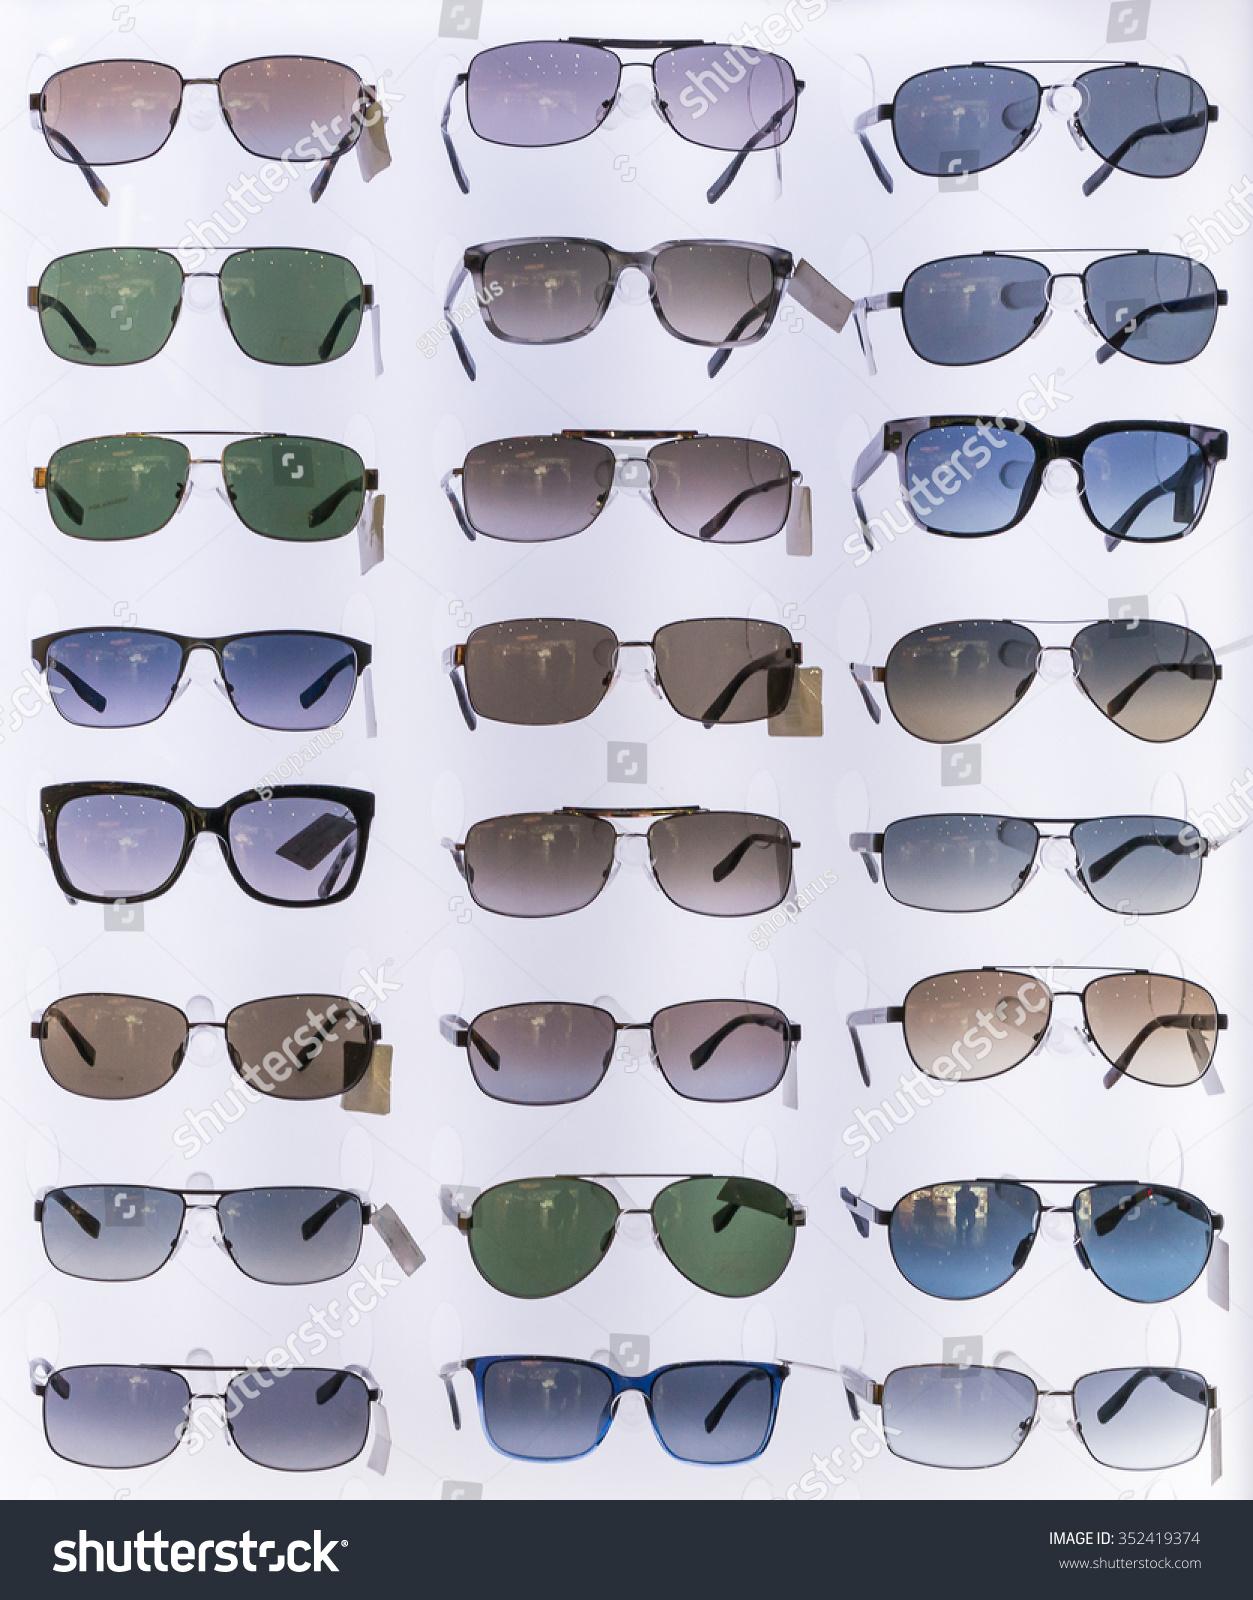 Eyeglasses display - Sunglasses Shades Eyeglasses Display Backlight Stand At Unidentified Fashion Shop Shelf In Airport Duty